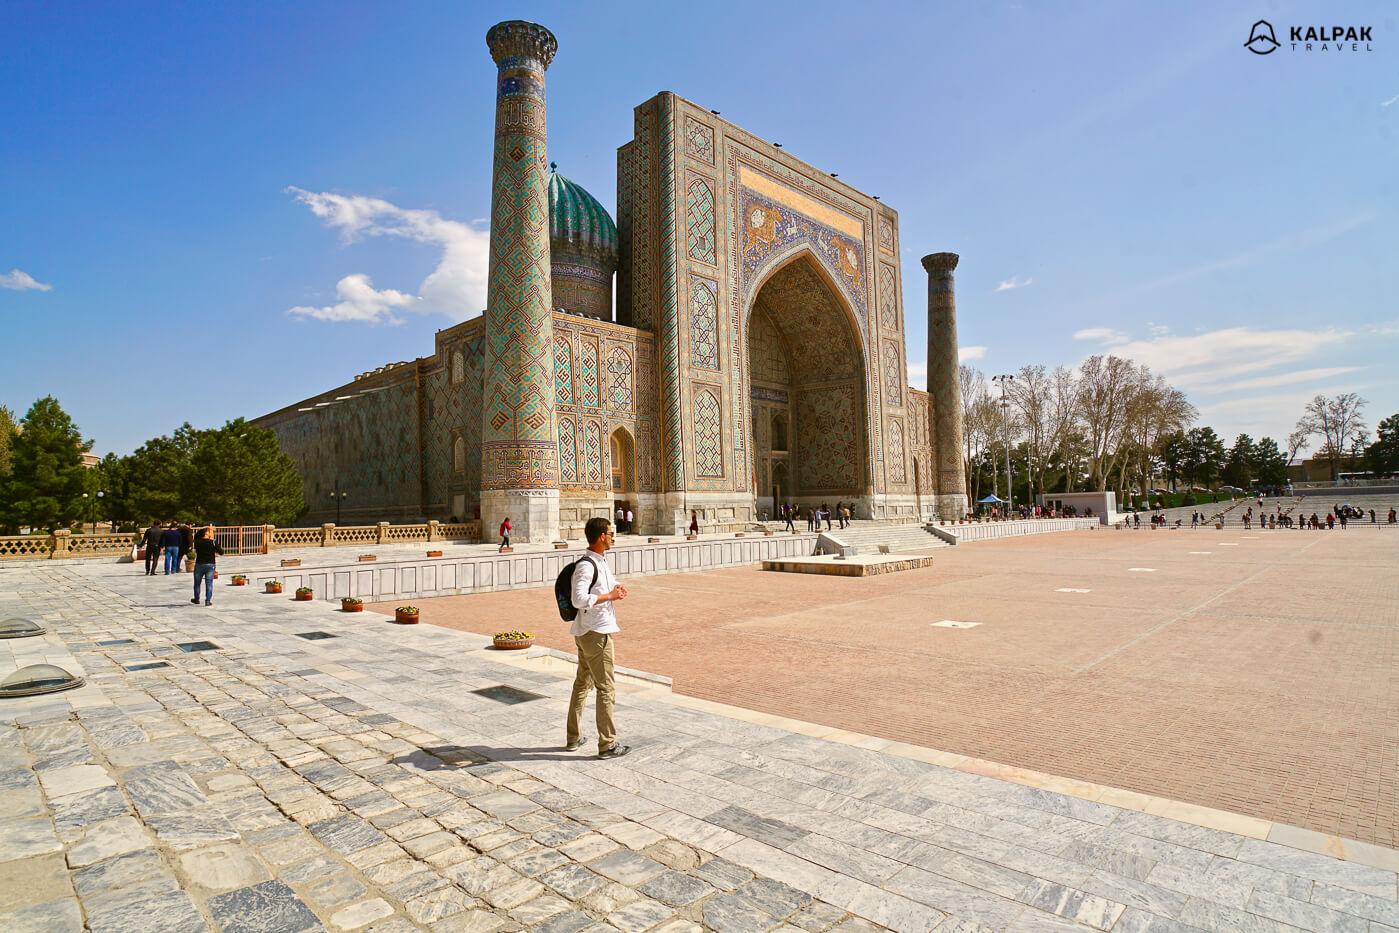 Sher Dor Madrasa in Registan, Samarkand